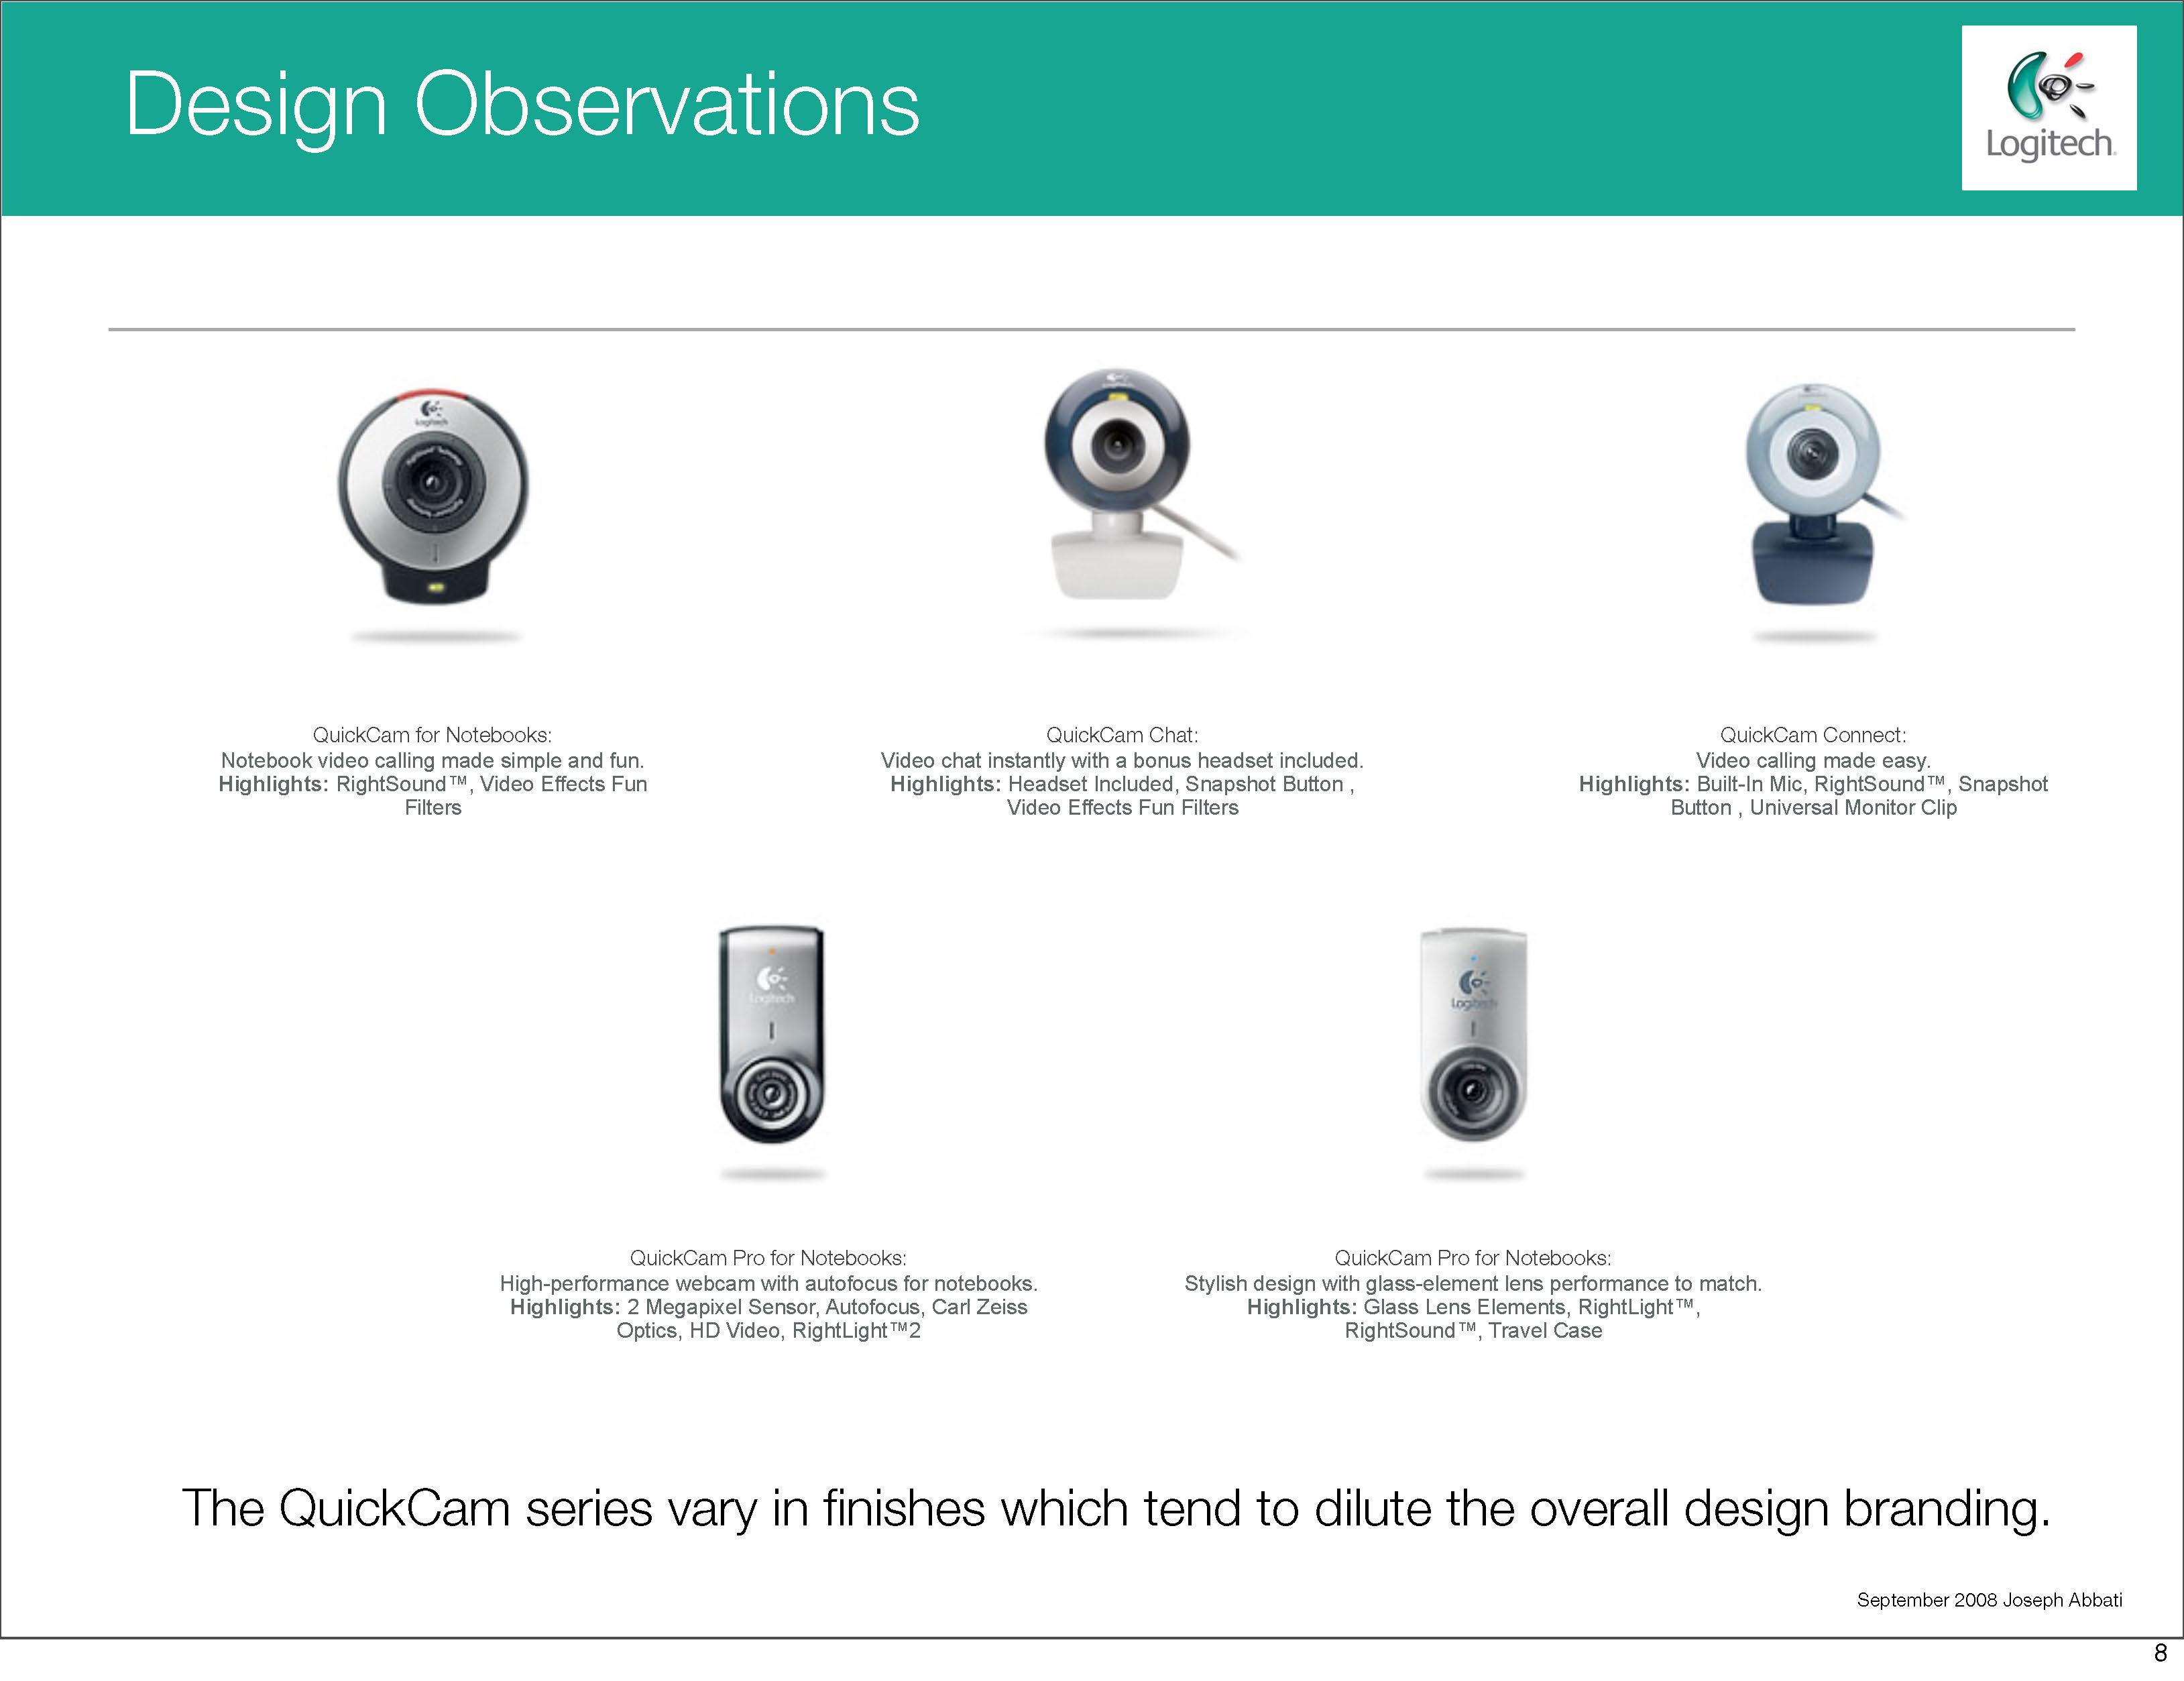 Logitech Swot Analysis Joseph Abbati Quickcam Wiring Diagram